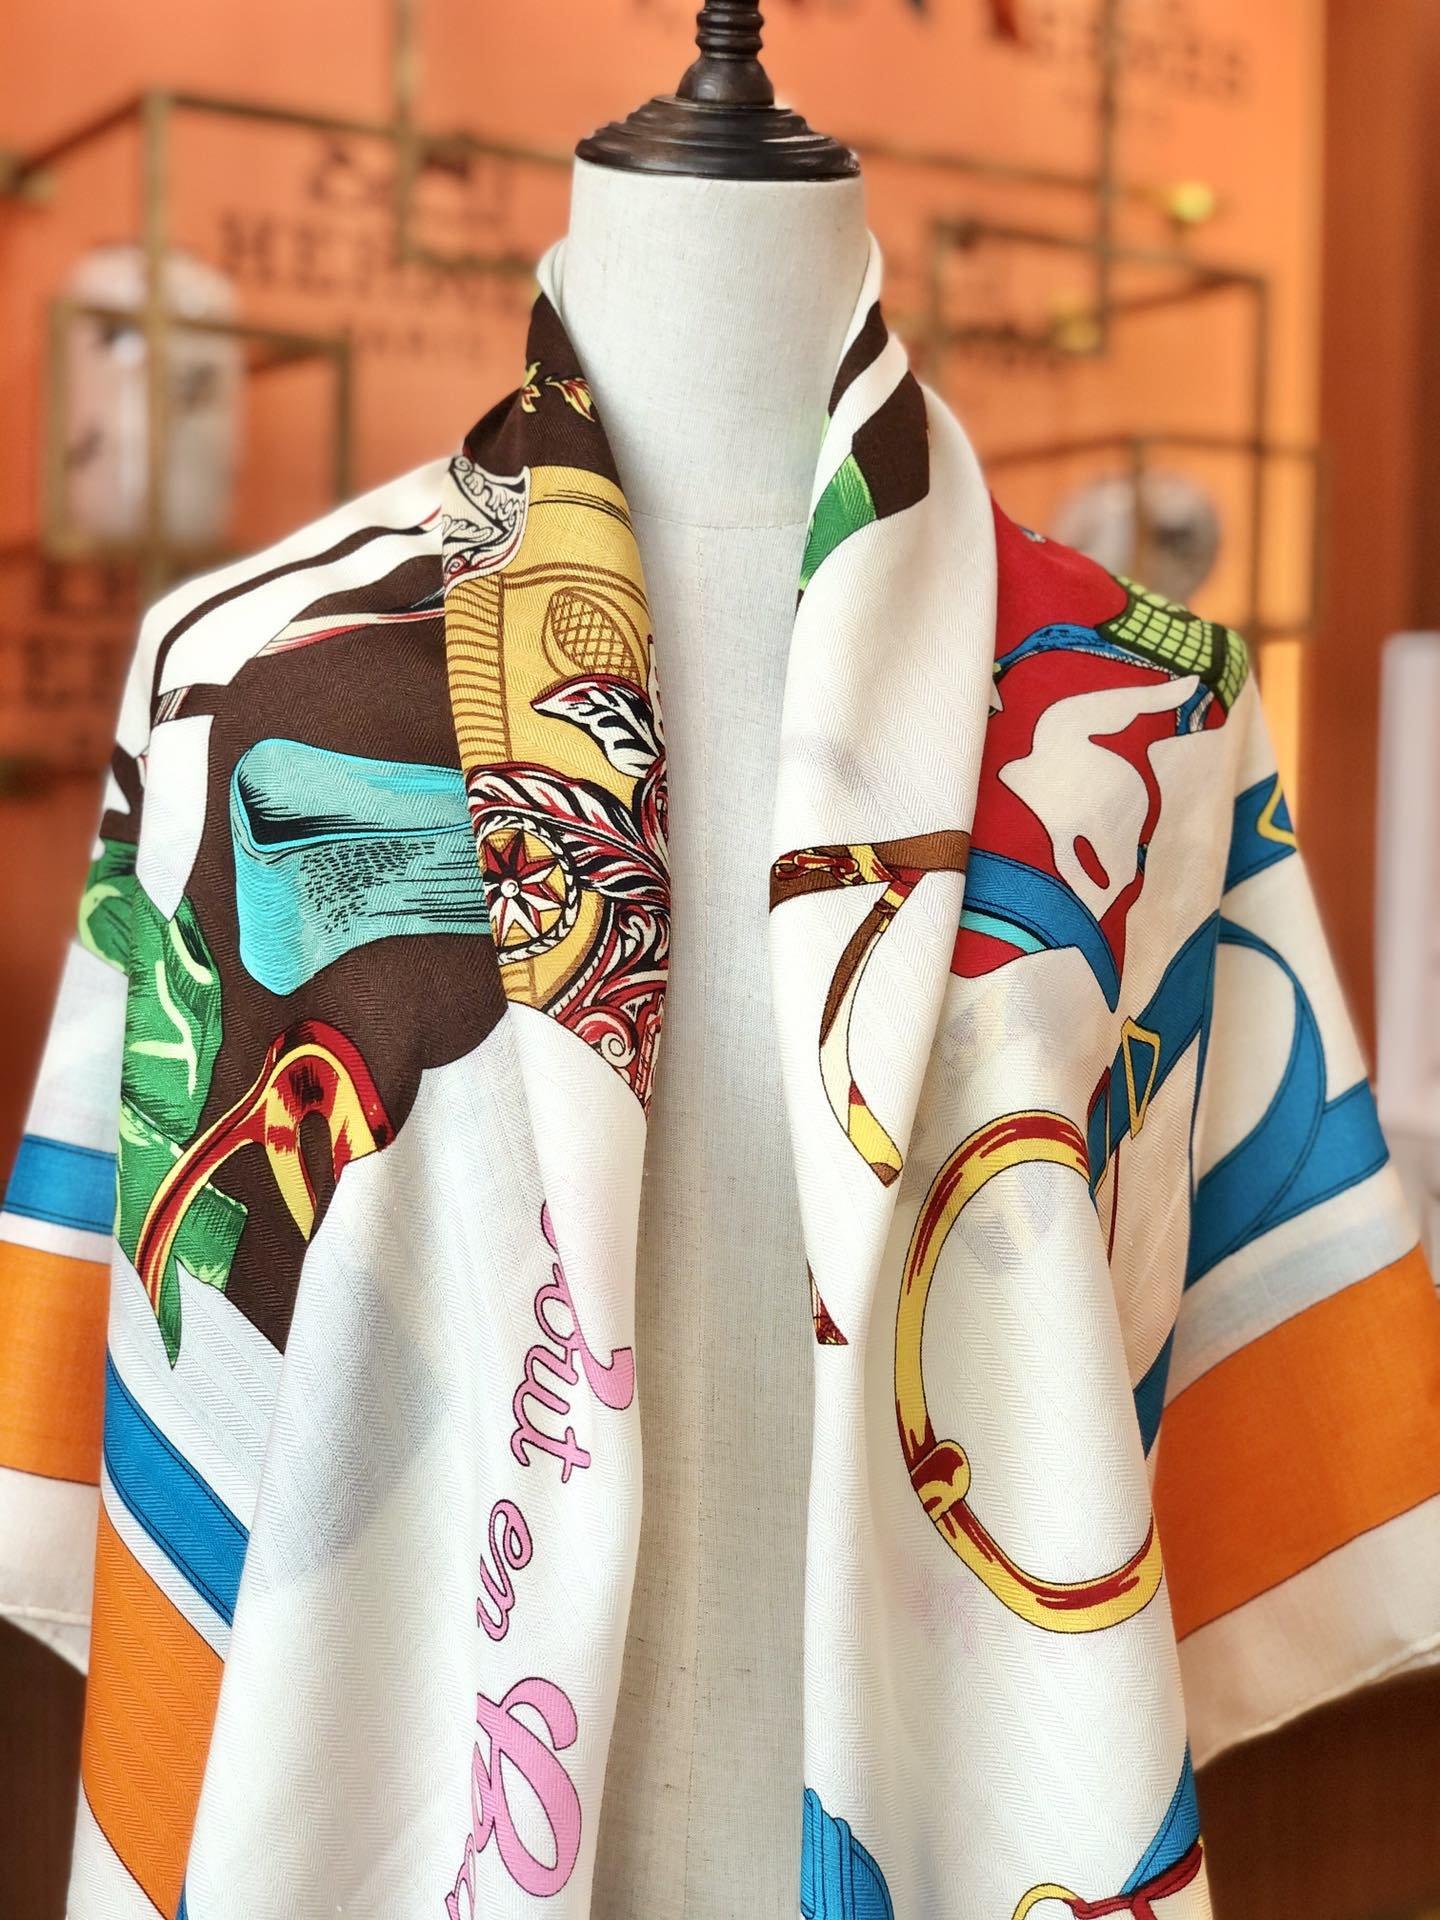 Hermes殿堂级御用丝绒大方巾(图10)